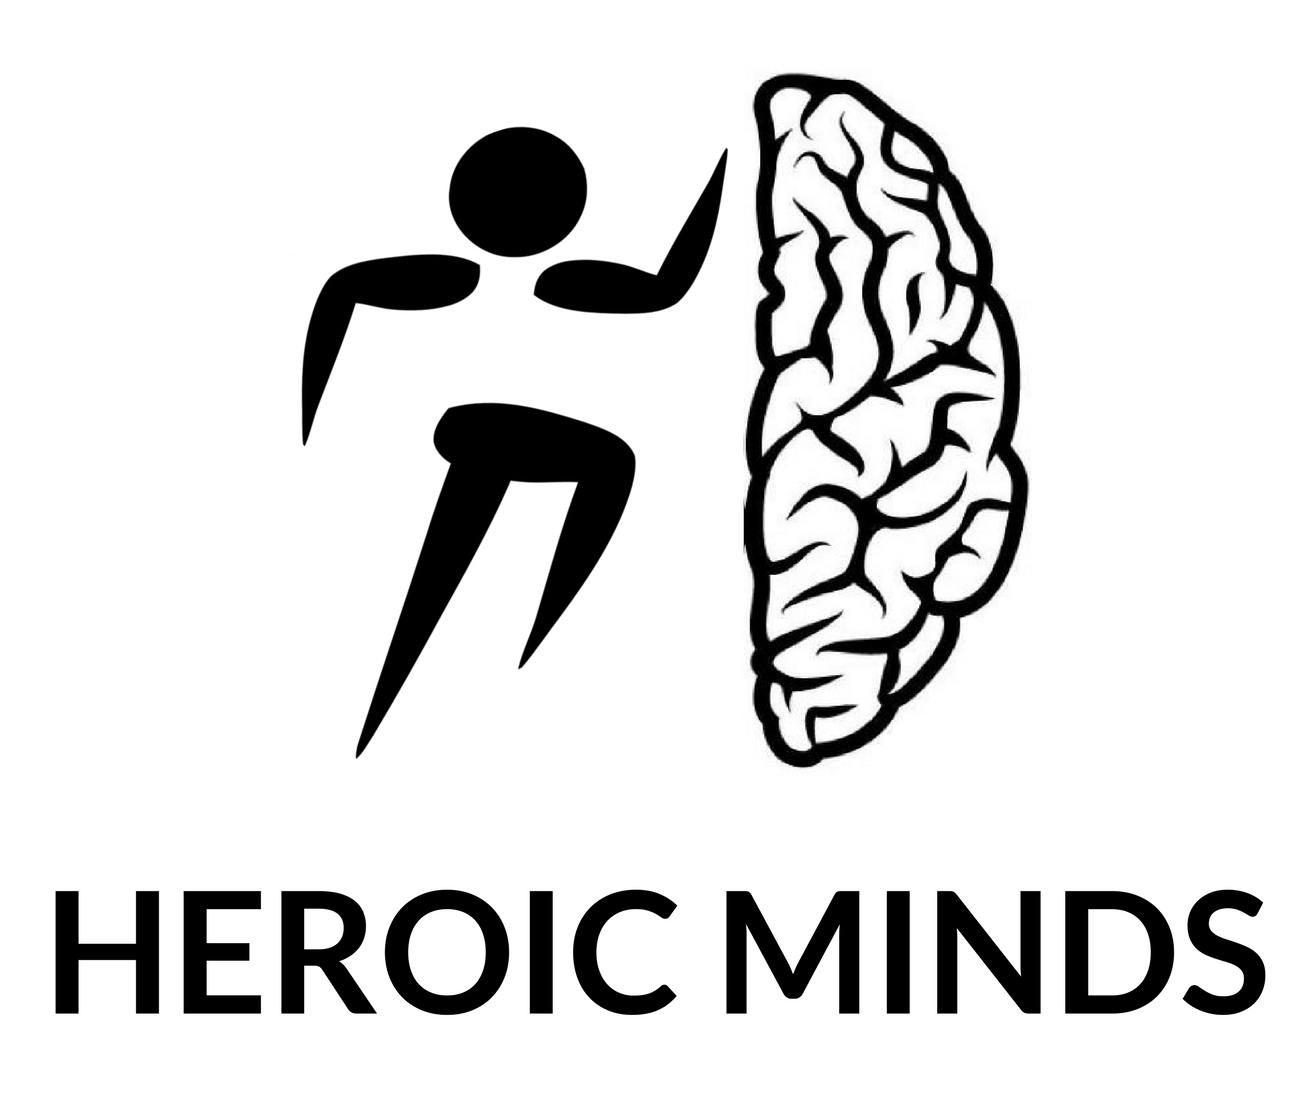 Heroic Minds